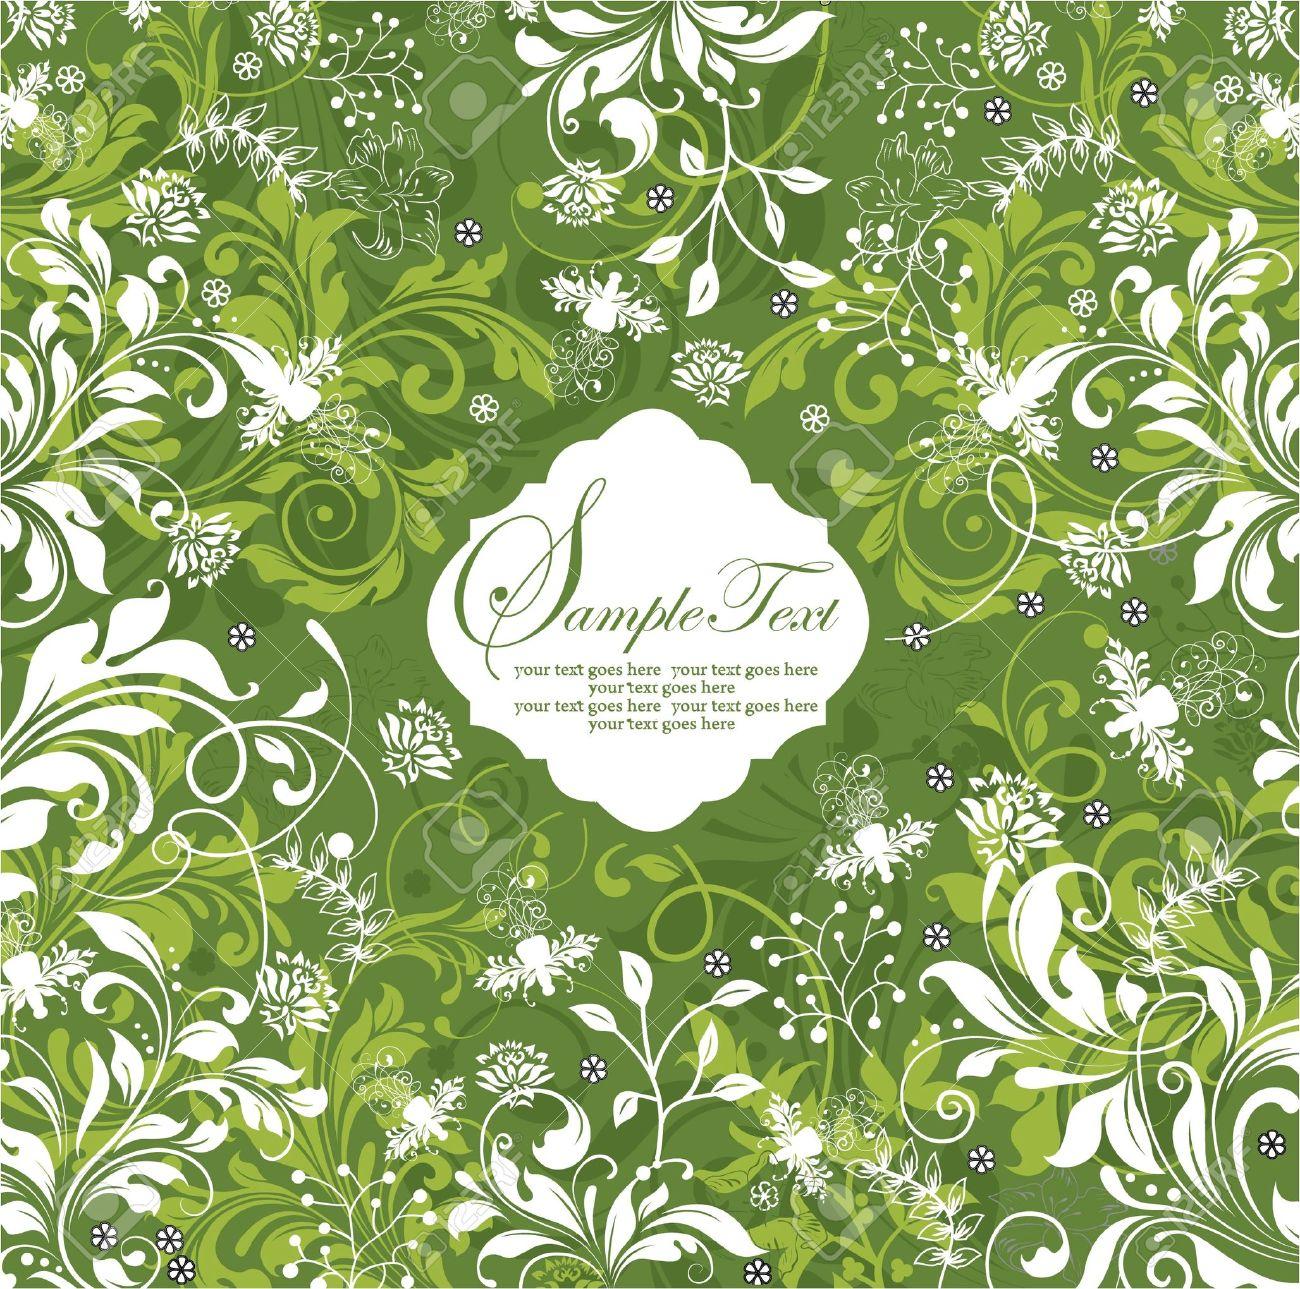 green floral invitation card Stock Vector - 15341270